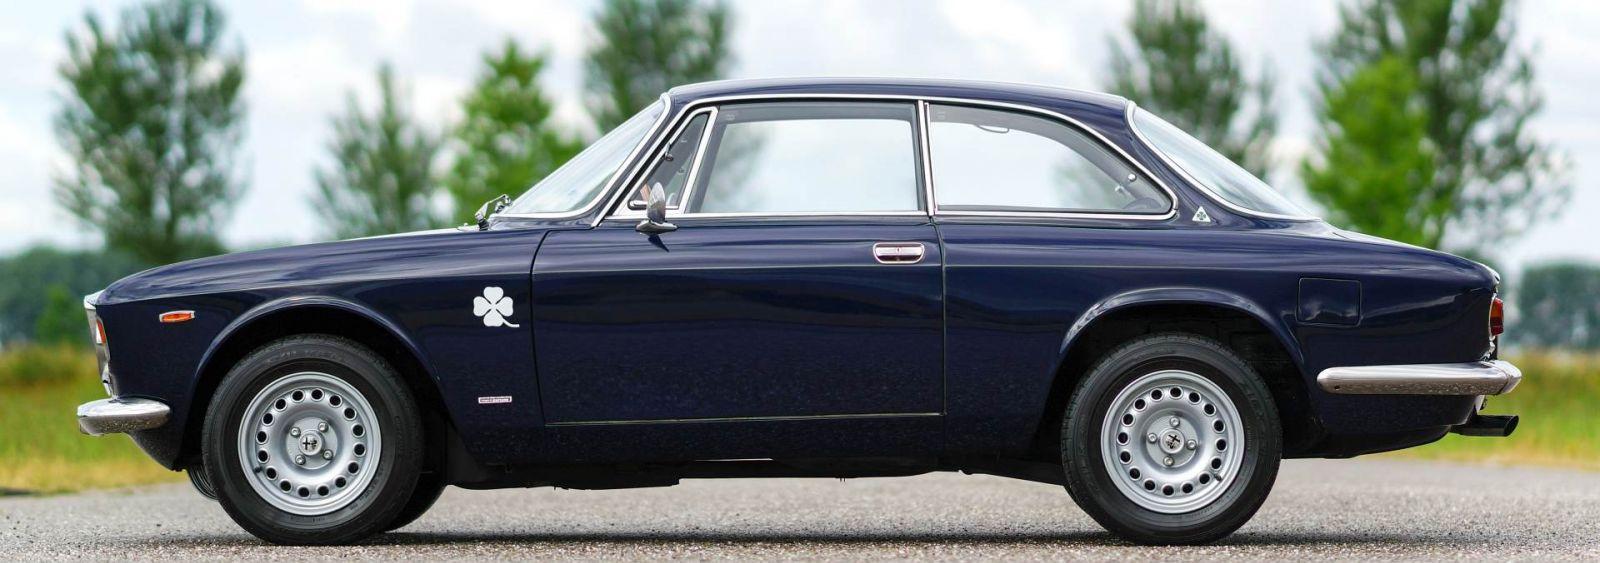 Alfa romeo gt 1300 junior 1969 welcome to classicargarage for Garage alfa romeo villeneuve d ascq